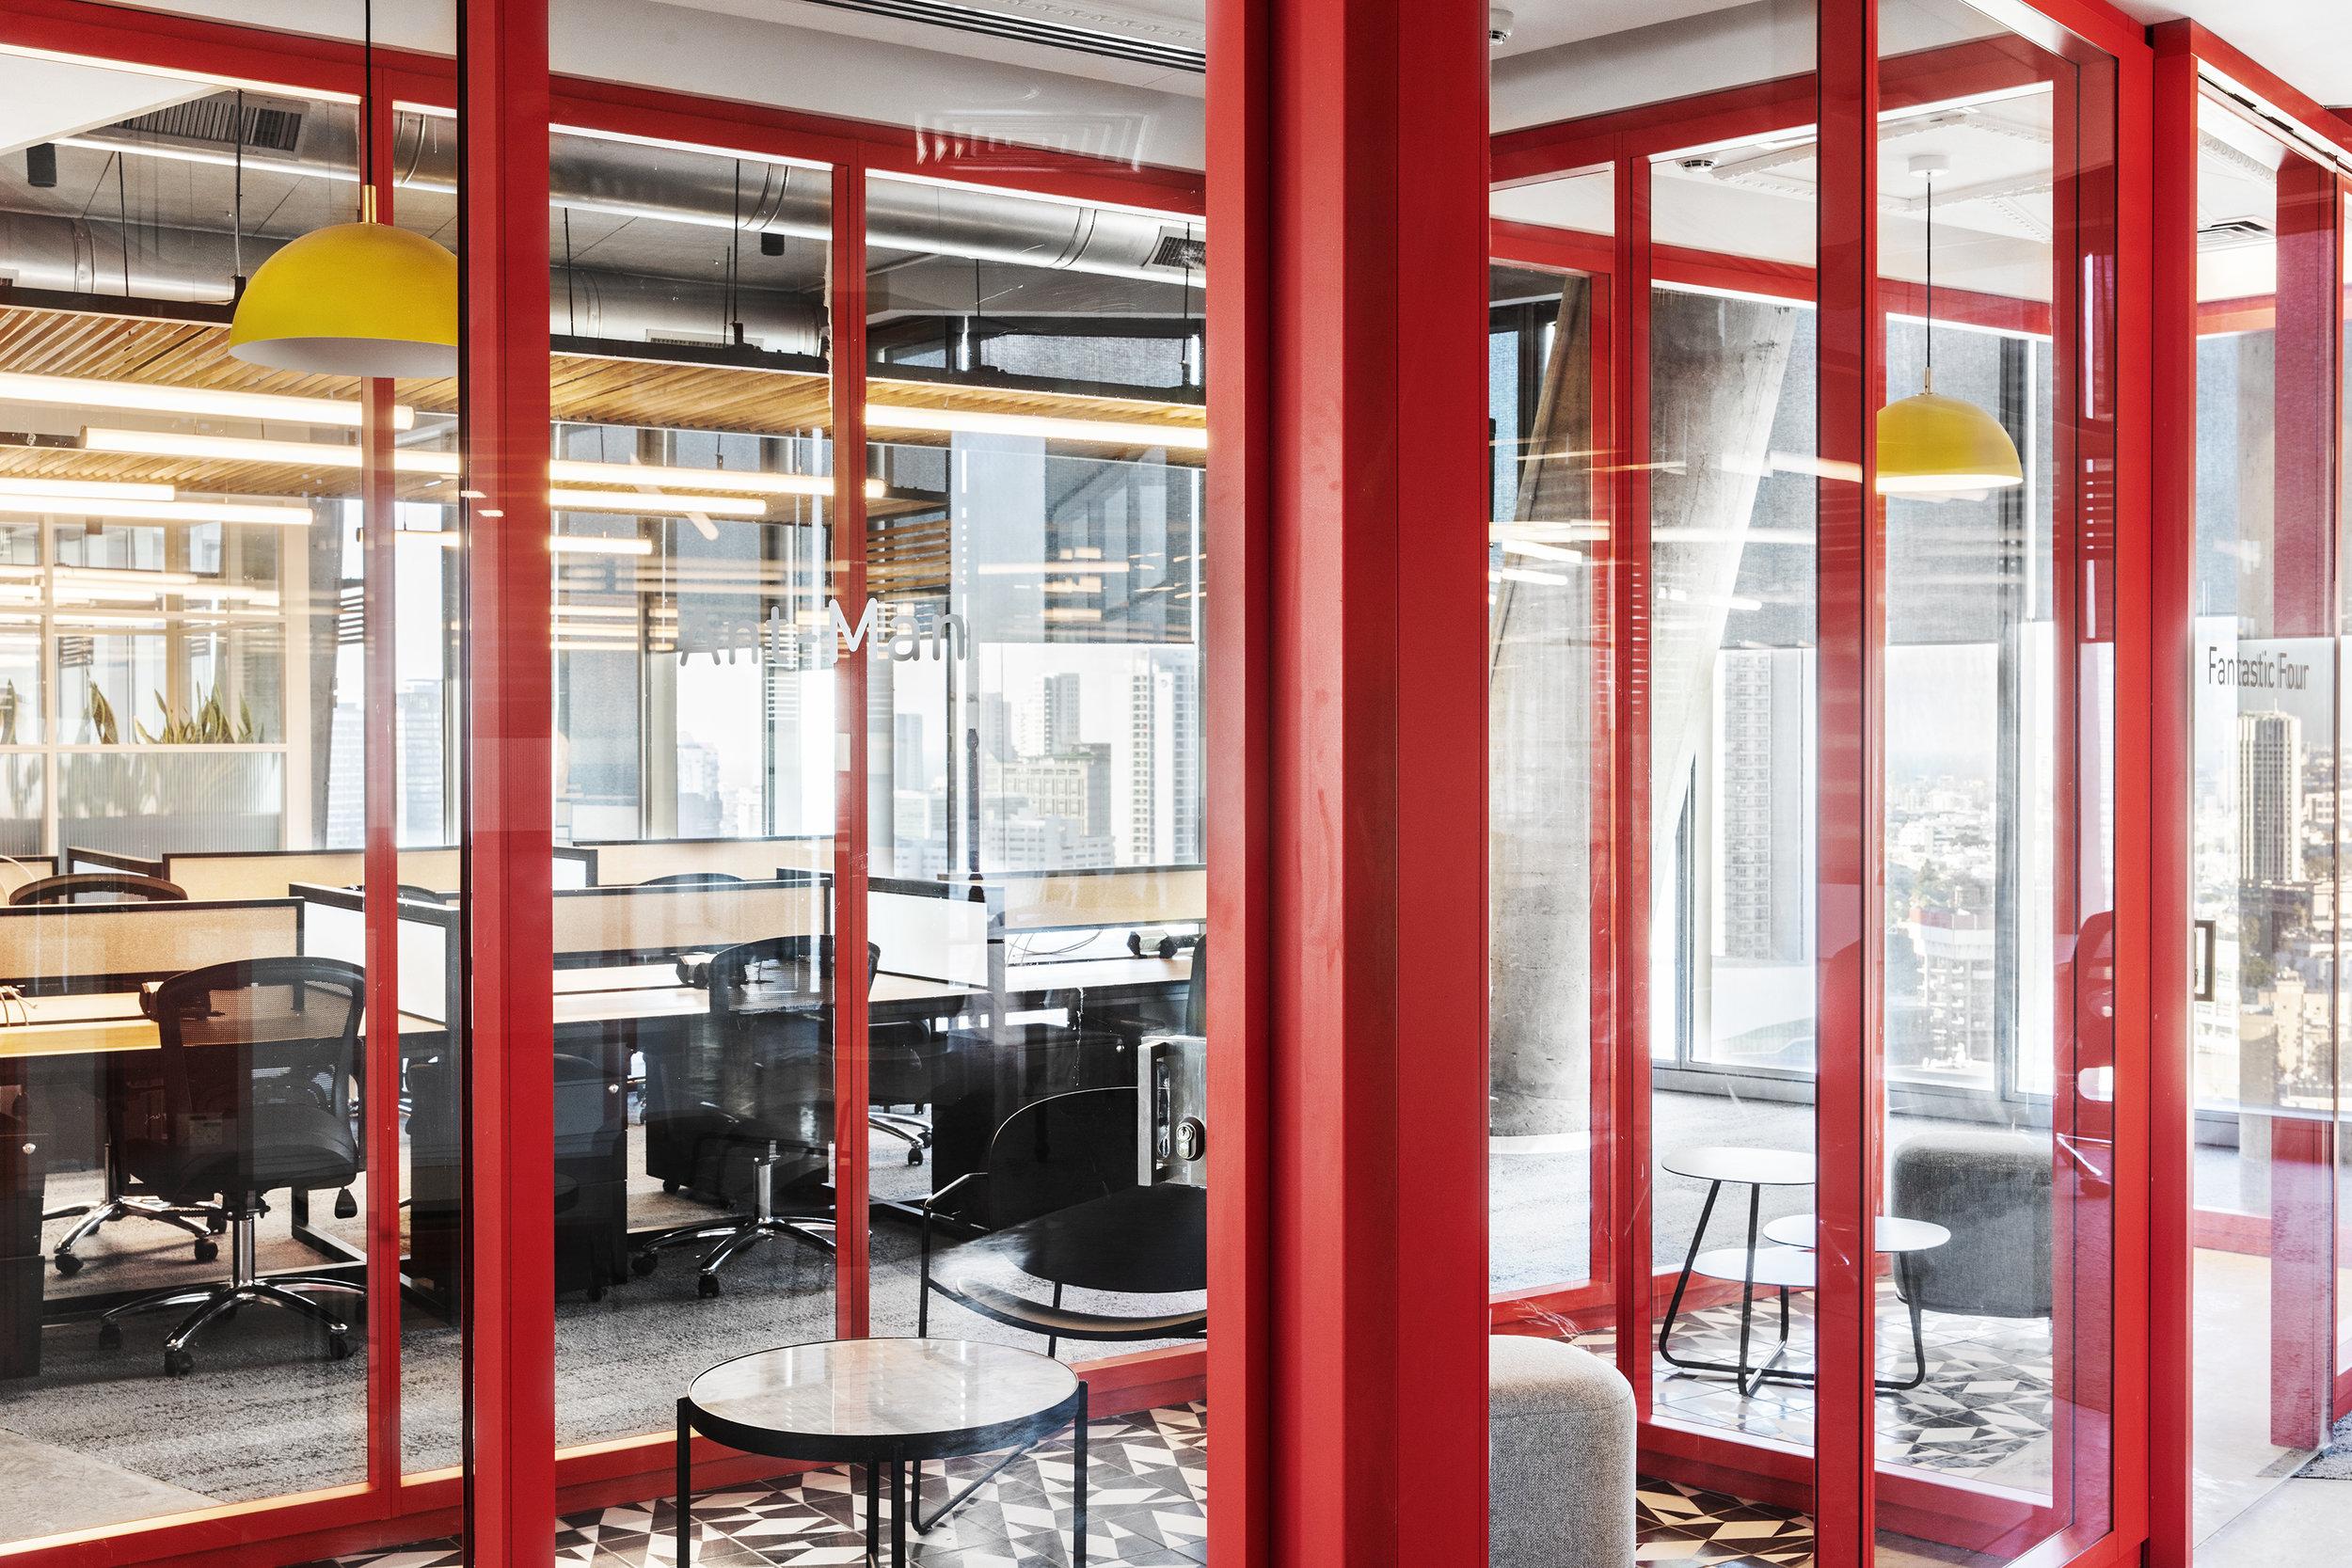 רואי דוד אדריכלות - אדריכל - נטורל אינטליג'נס - ROY DAVID - ARCHITECTURE - ARCHITECT - NI (1).jpg